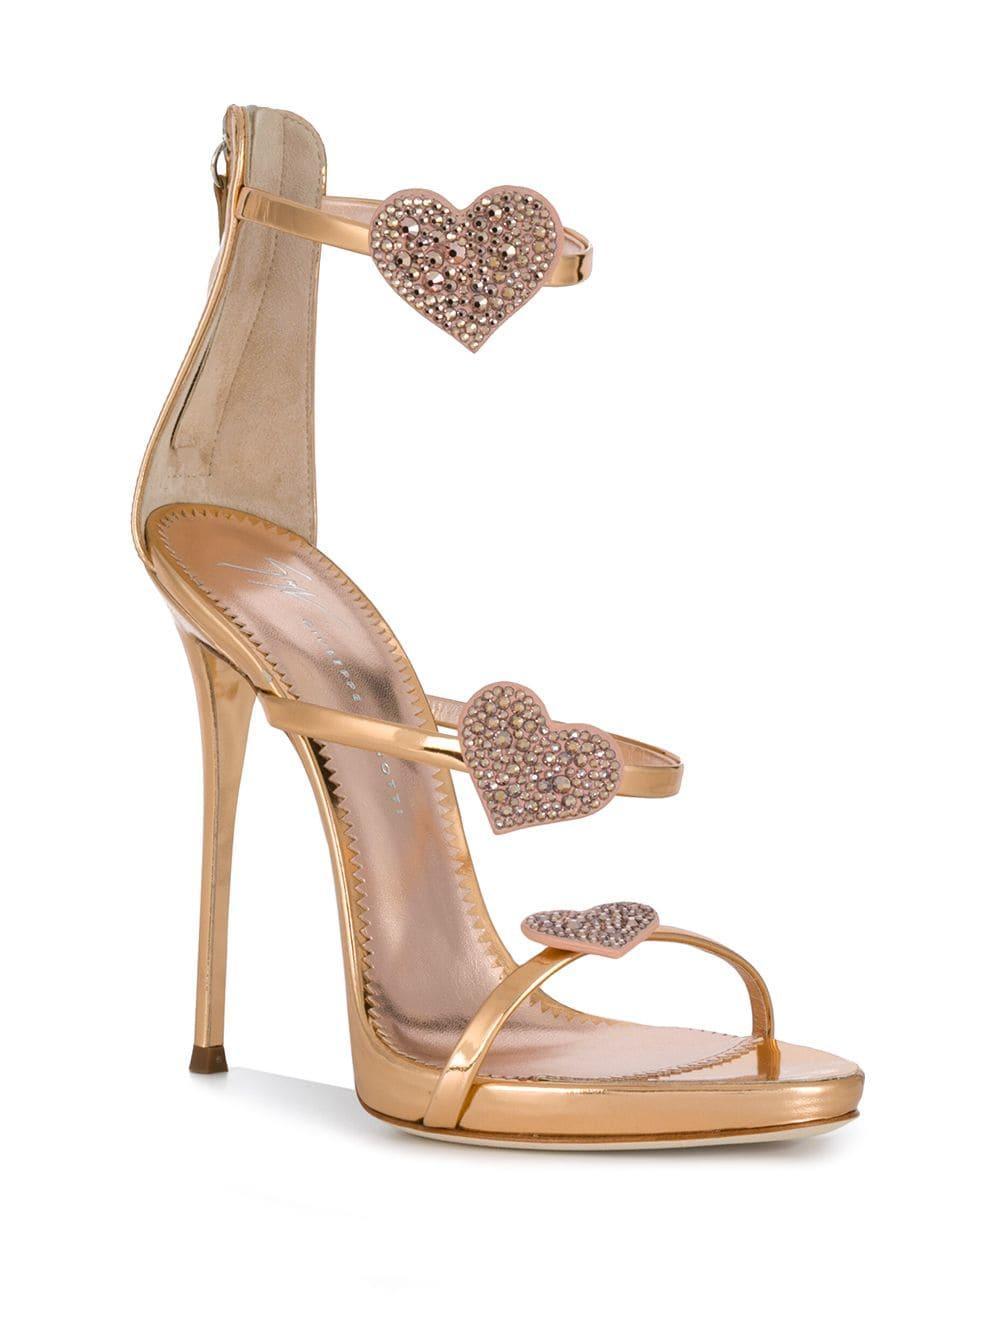 bebc12995 Lyst - Giuseppe Zanotti Harmony Love Sandals in Metallic - Save 9%